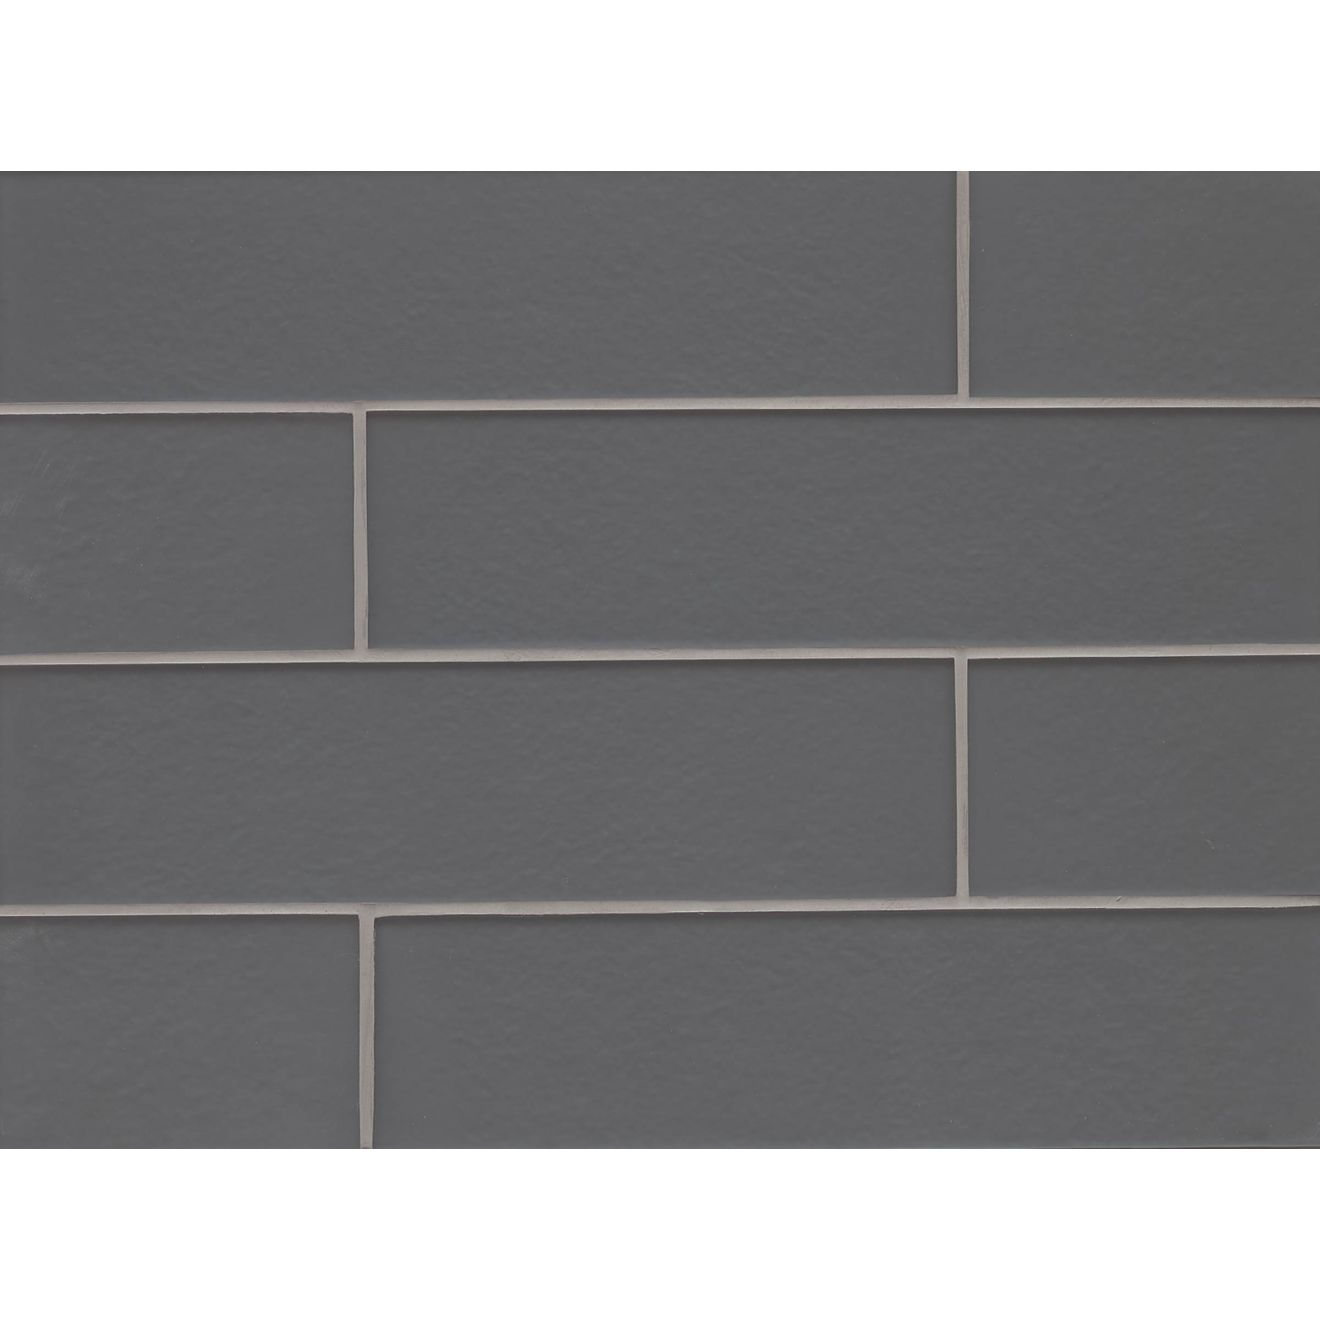 "Manhattan 4"" x 16"" Wall Tile in Concrete"